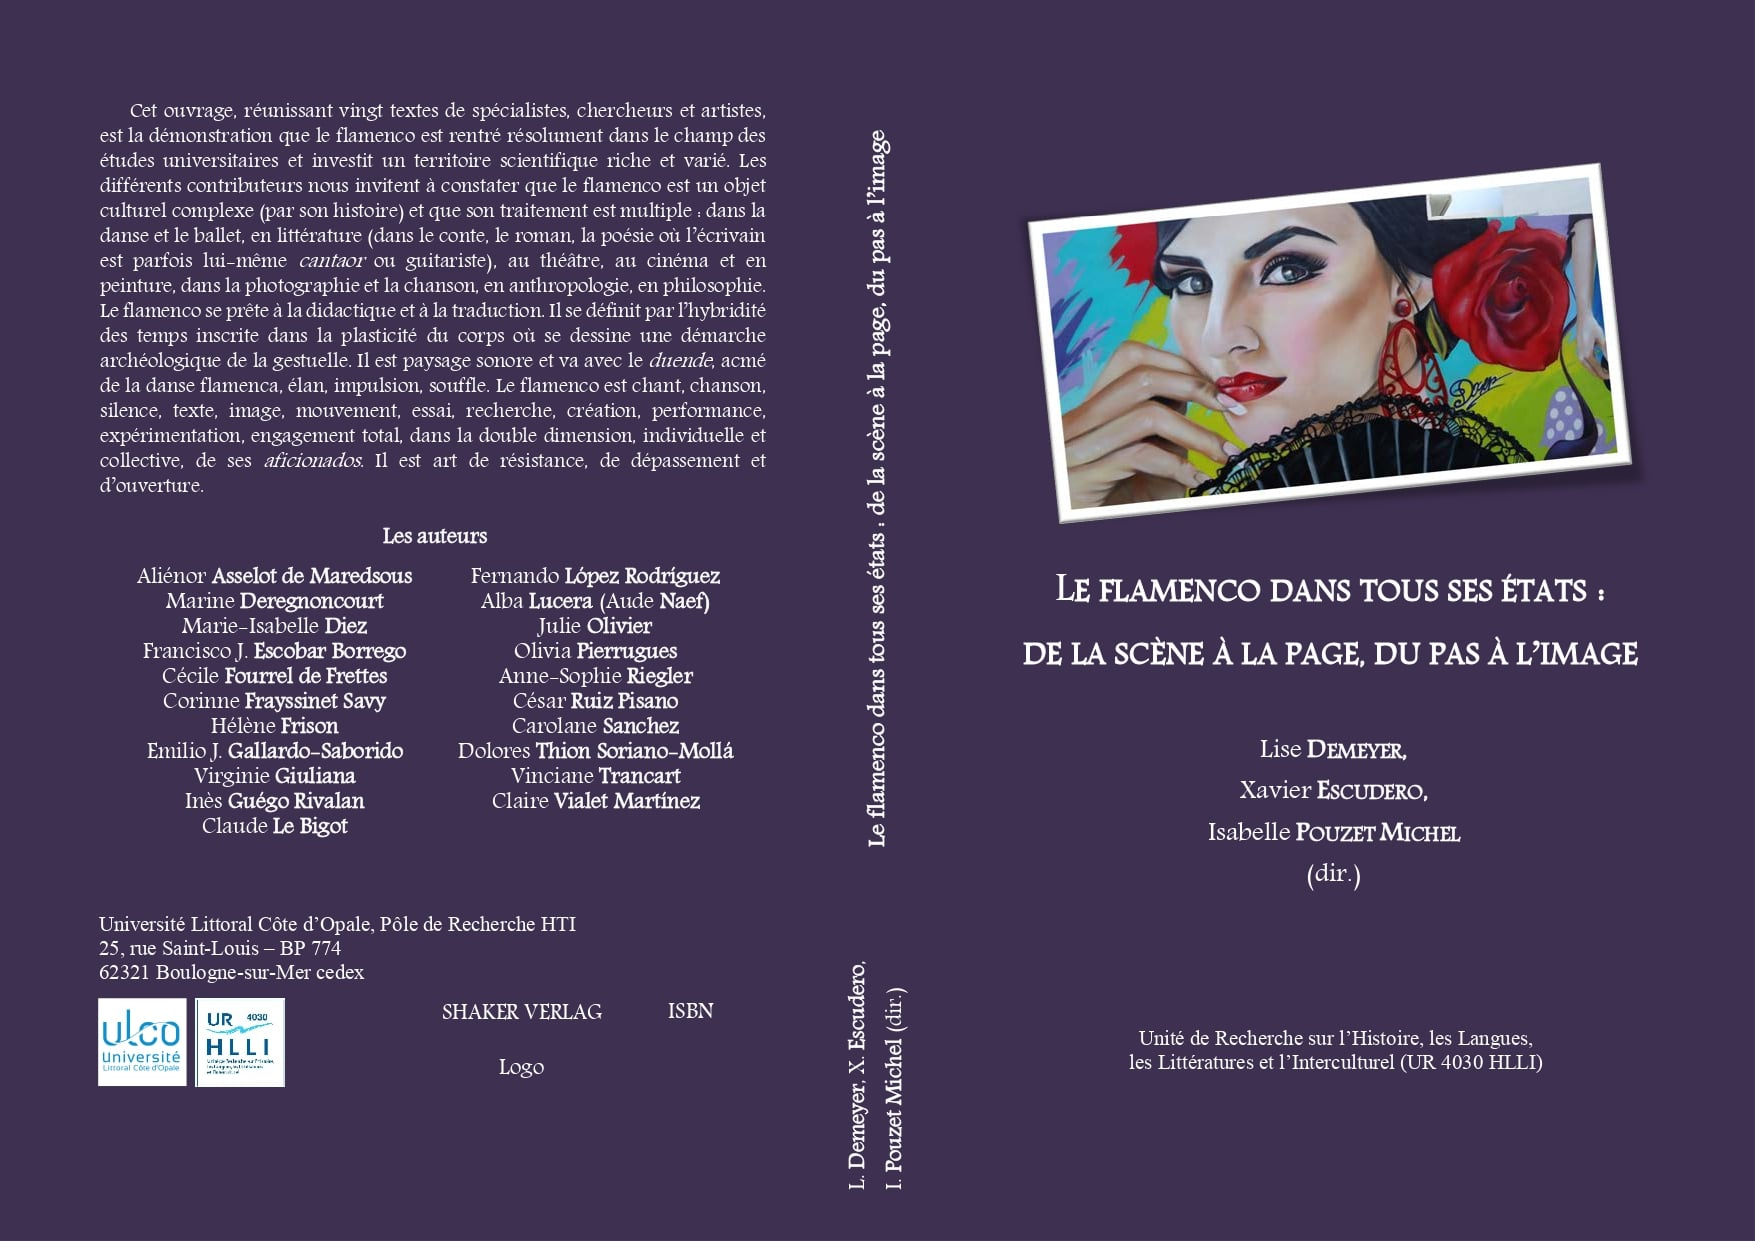 Actes d'un colloque sur le flamenco